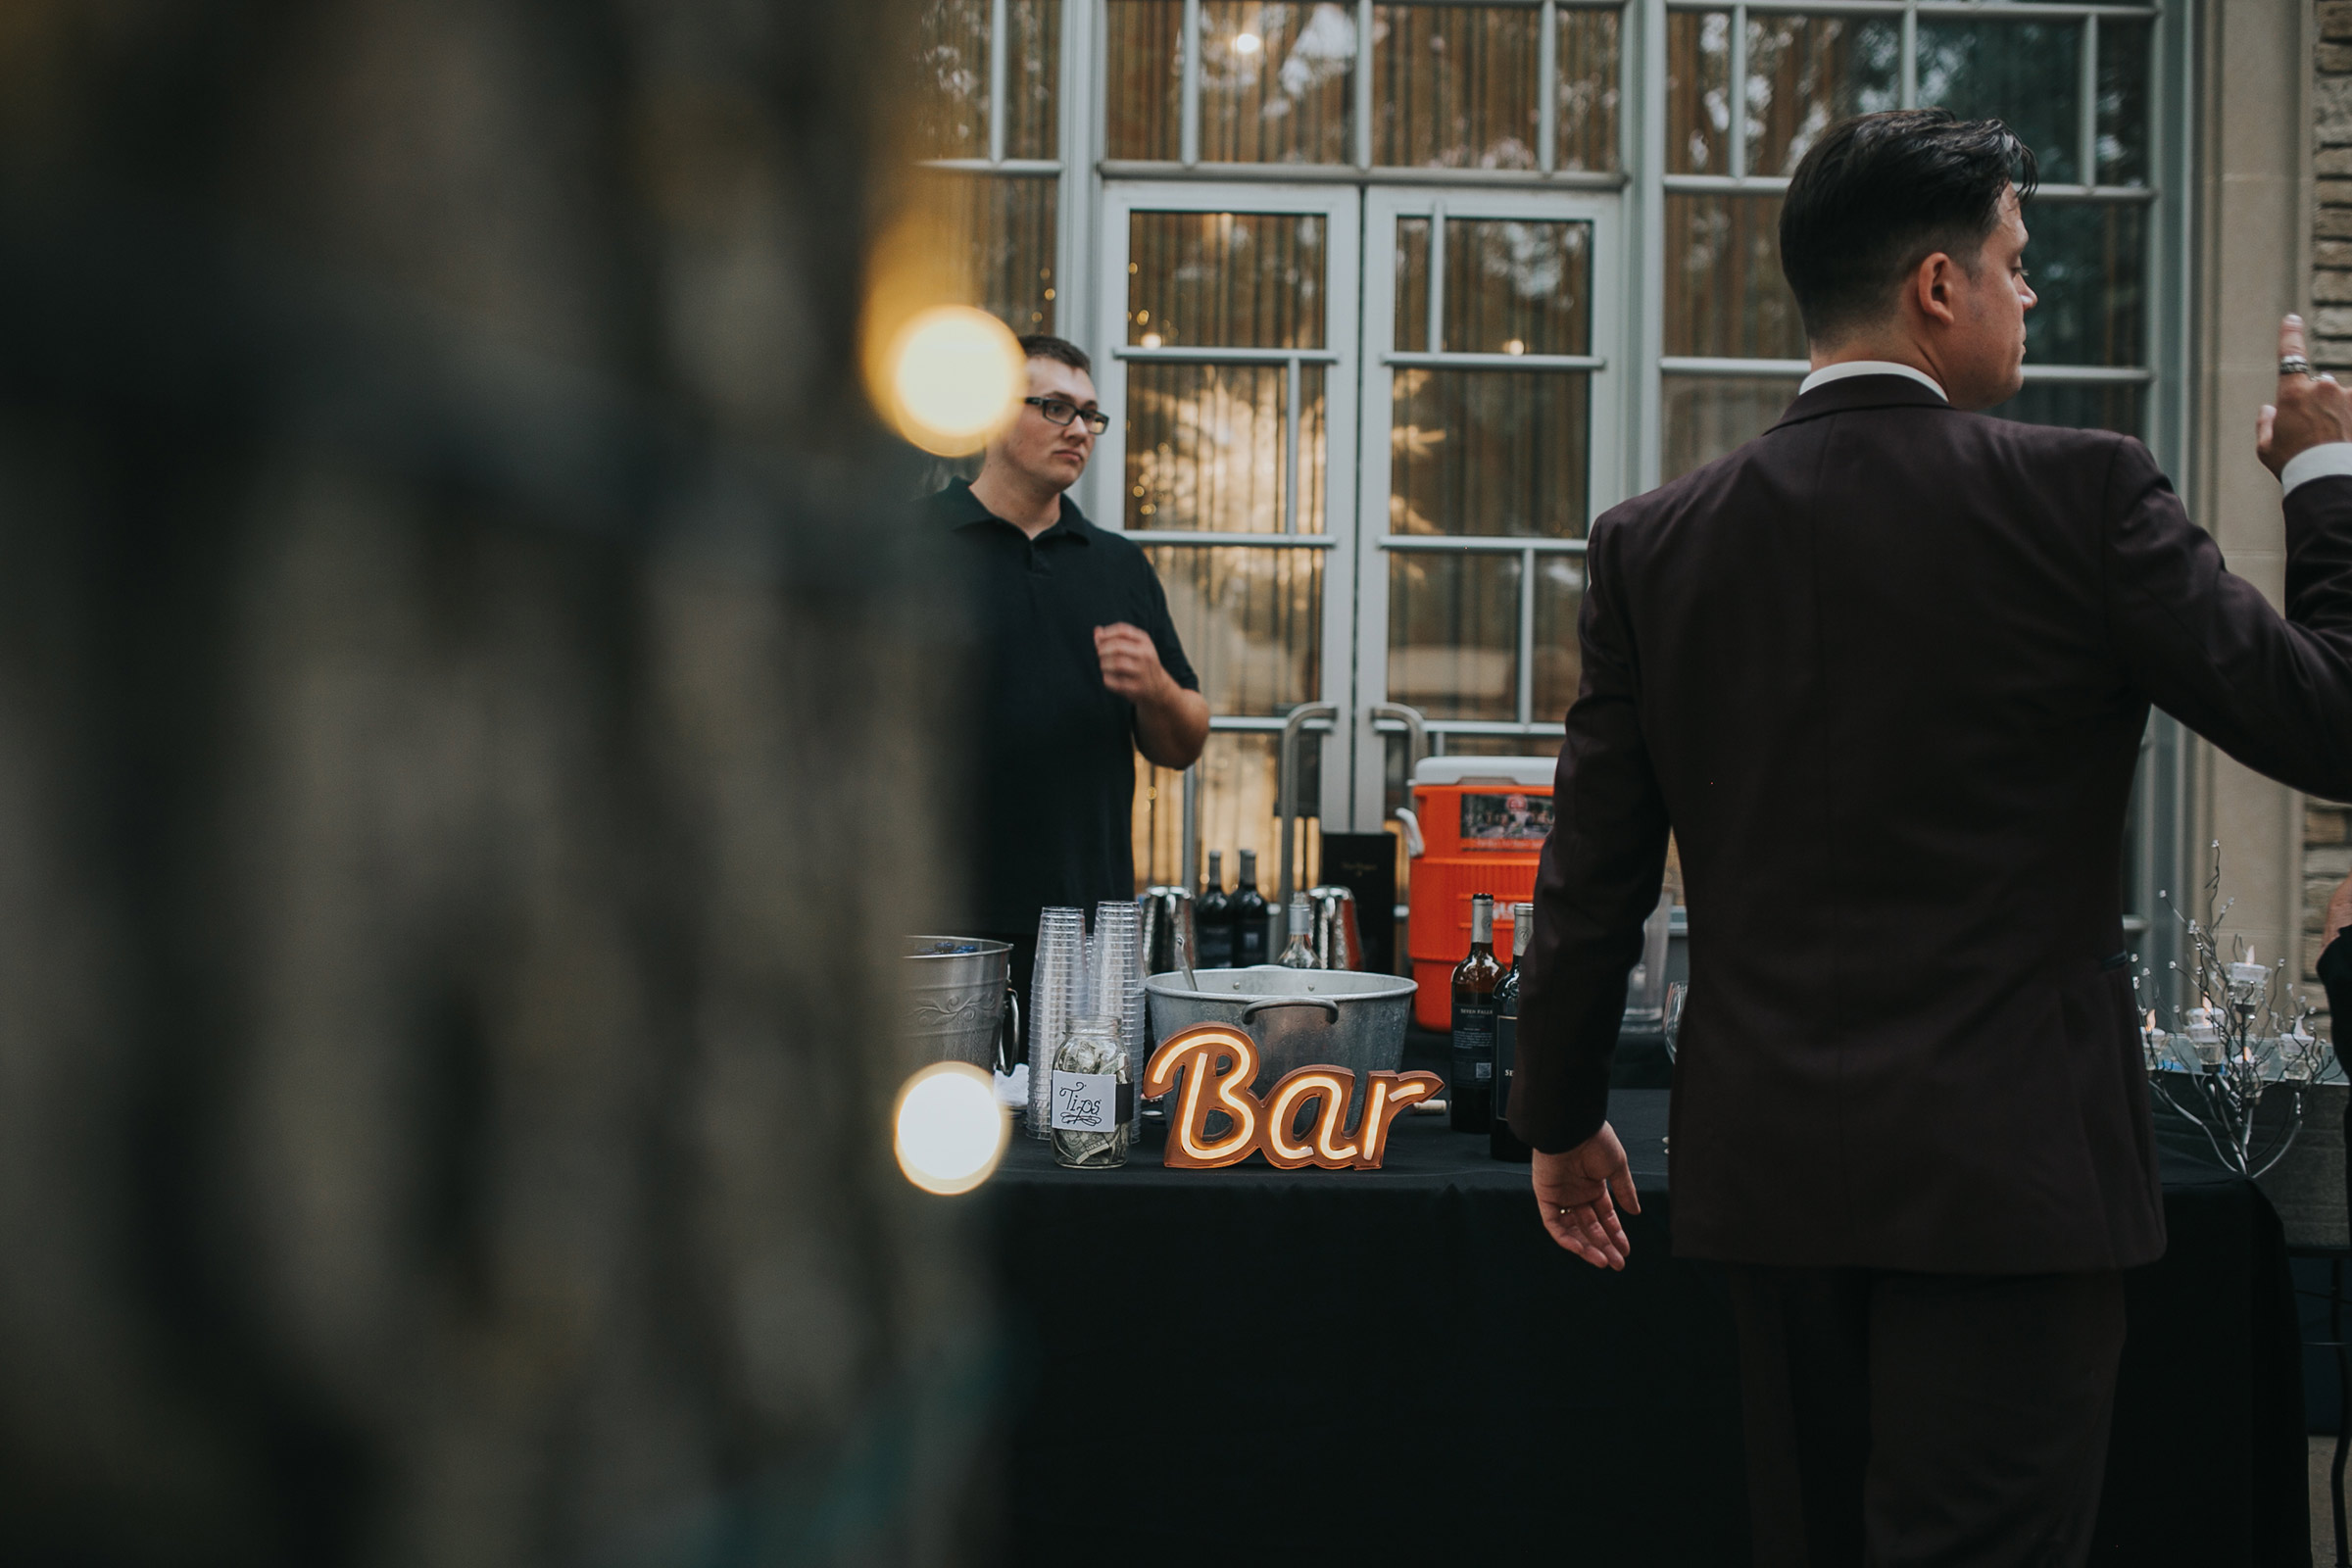 wedding-bar-desmoines-iowa-art-center-raelyn-ramey-photography.jpg